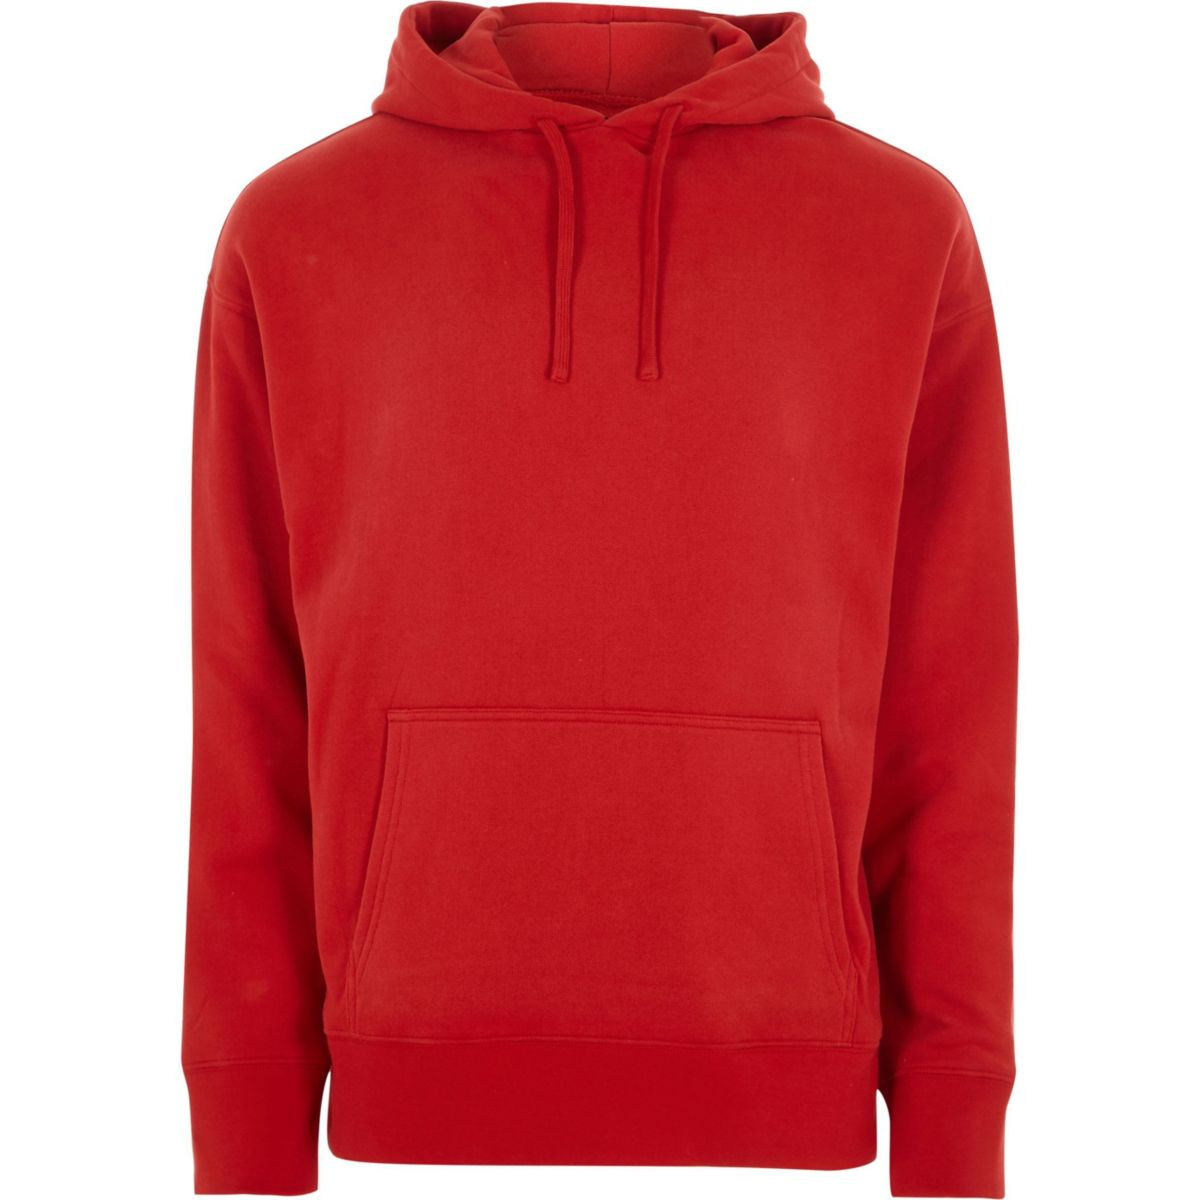 roter oversized hoodie hoodies sweatshirts sale herren. Black Bedroom Furniture Sets. Home Design Ideas